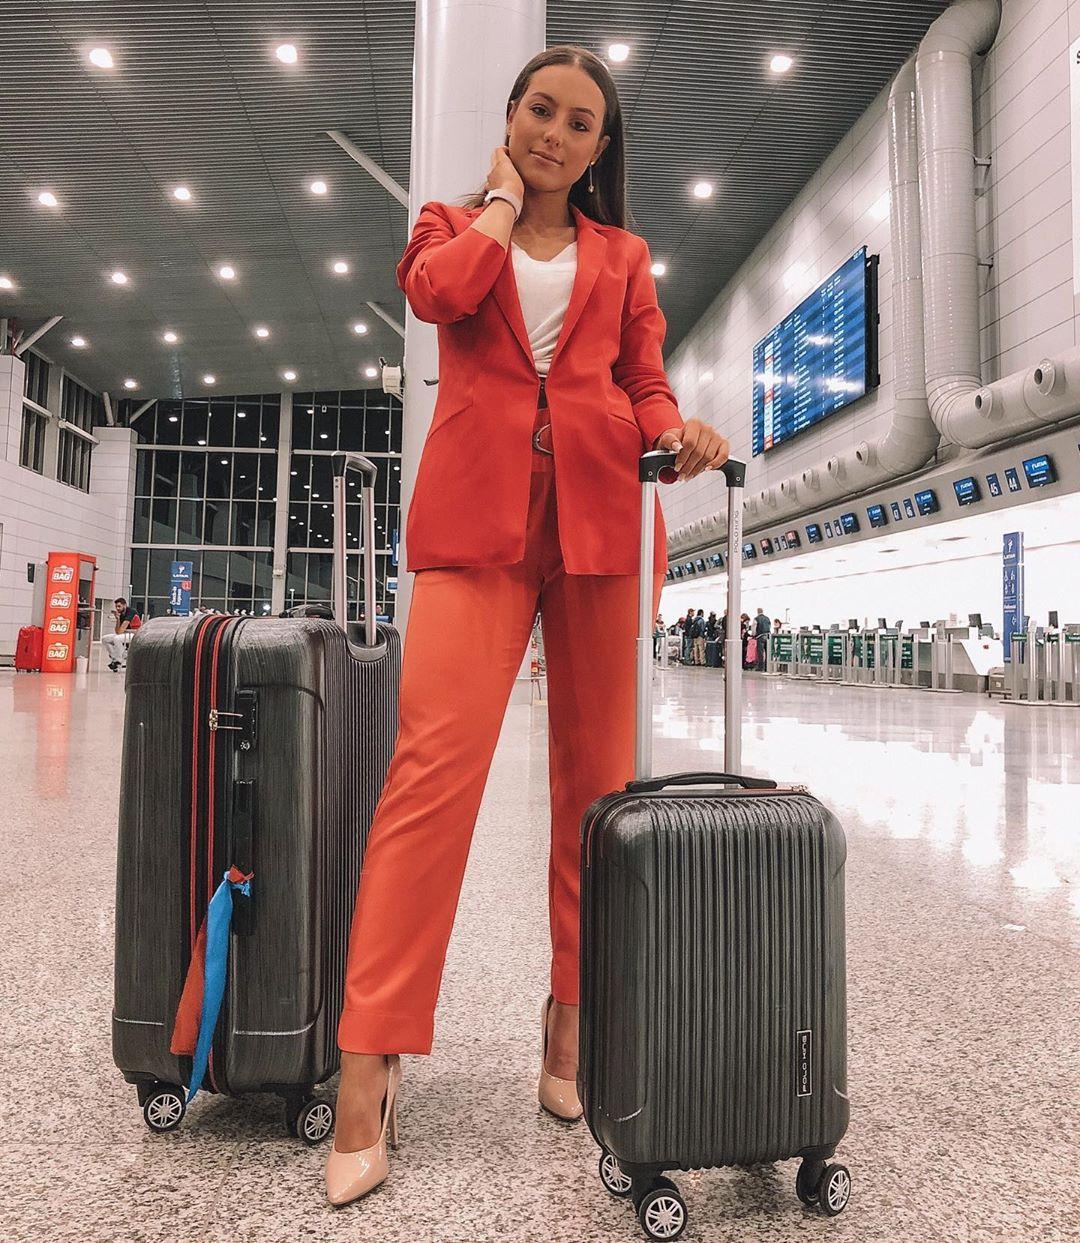 cristine boff sartor, segunda finalista de miss latinoamerica 2019. - Página 7 68747210